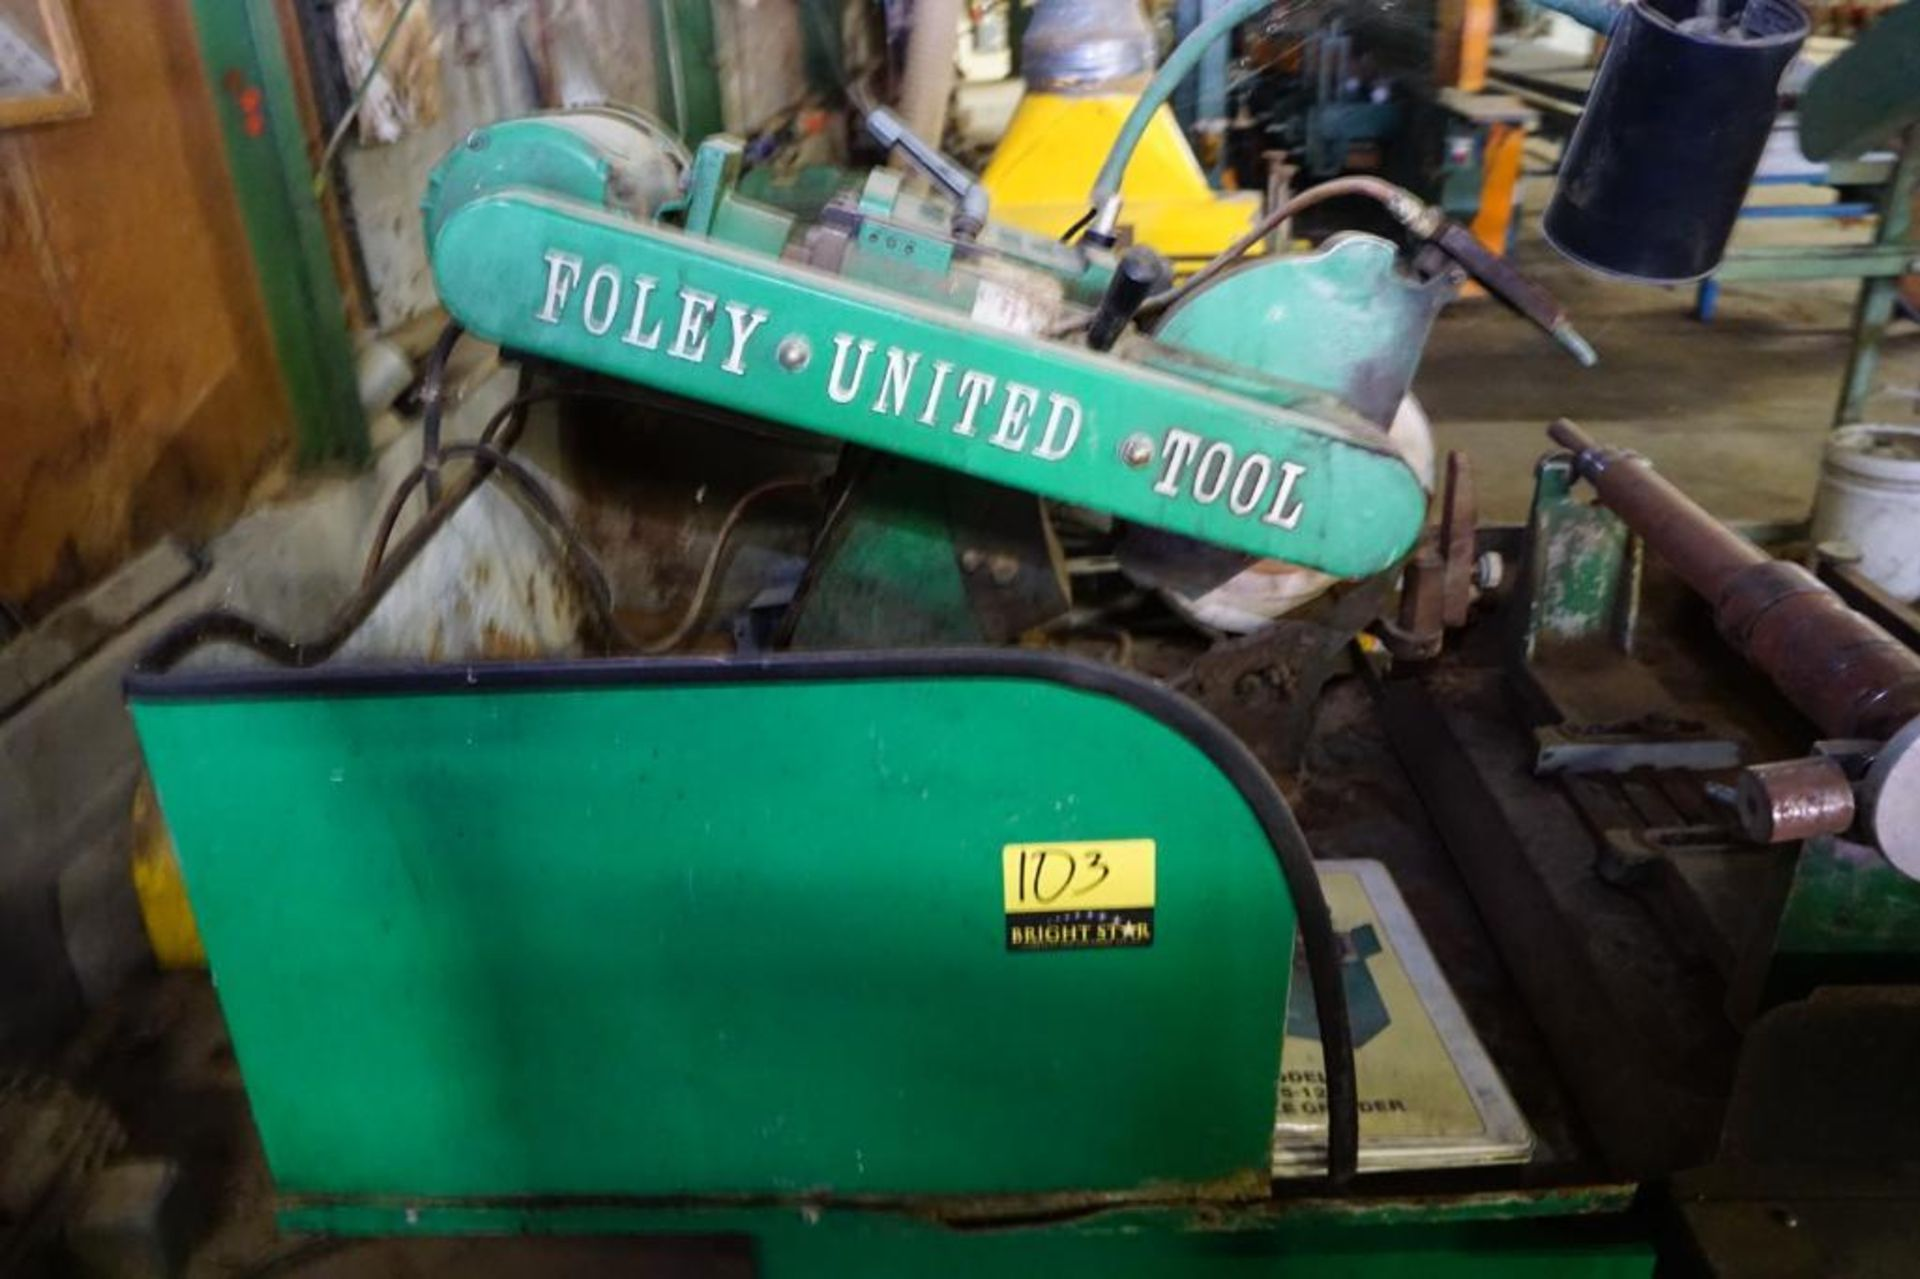 Foley United Sharpener - Image 4 of 7